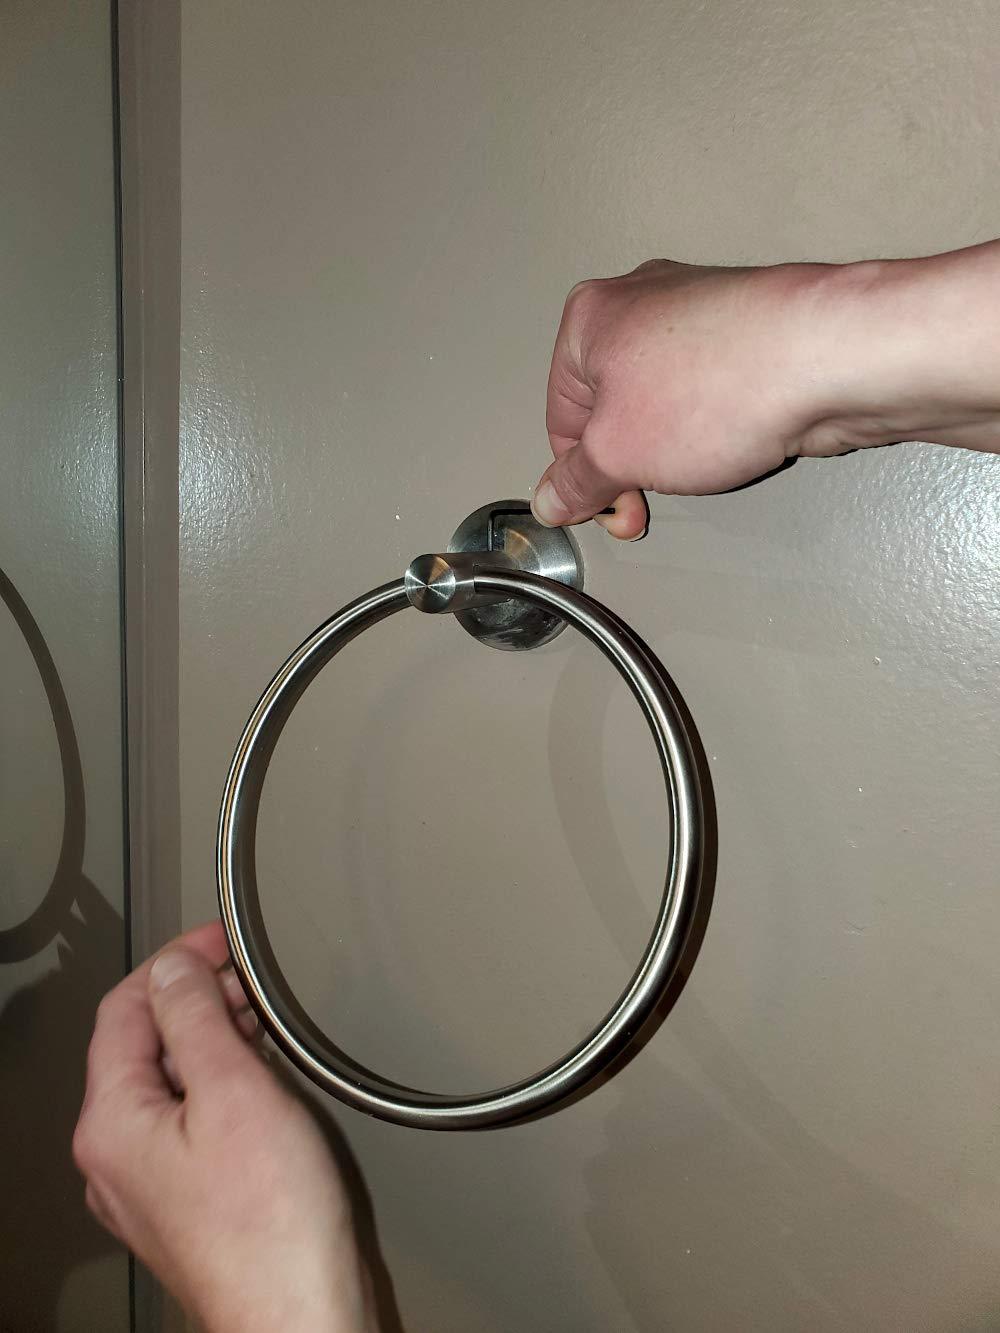 pack of 5 EKLIND 18510 5 MM Stubby-Ball-Hex-L Key allen wrench